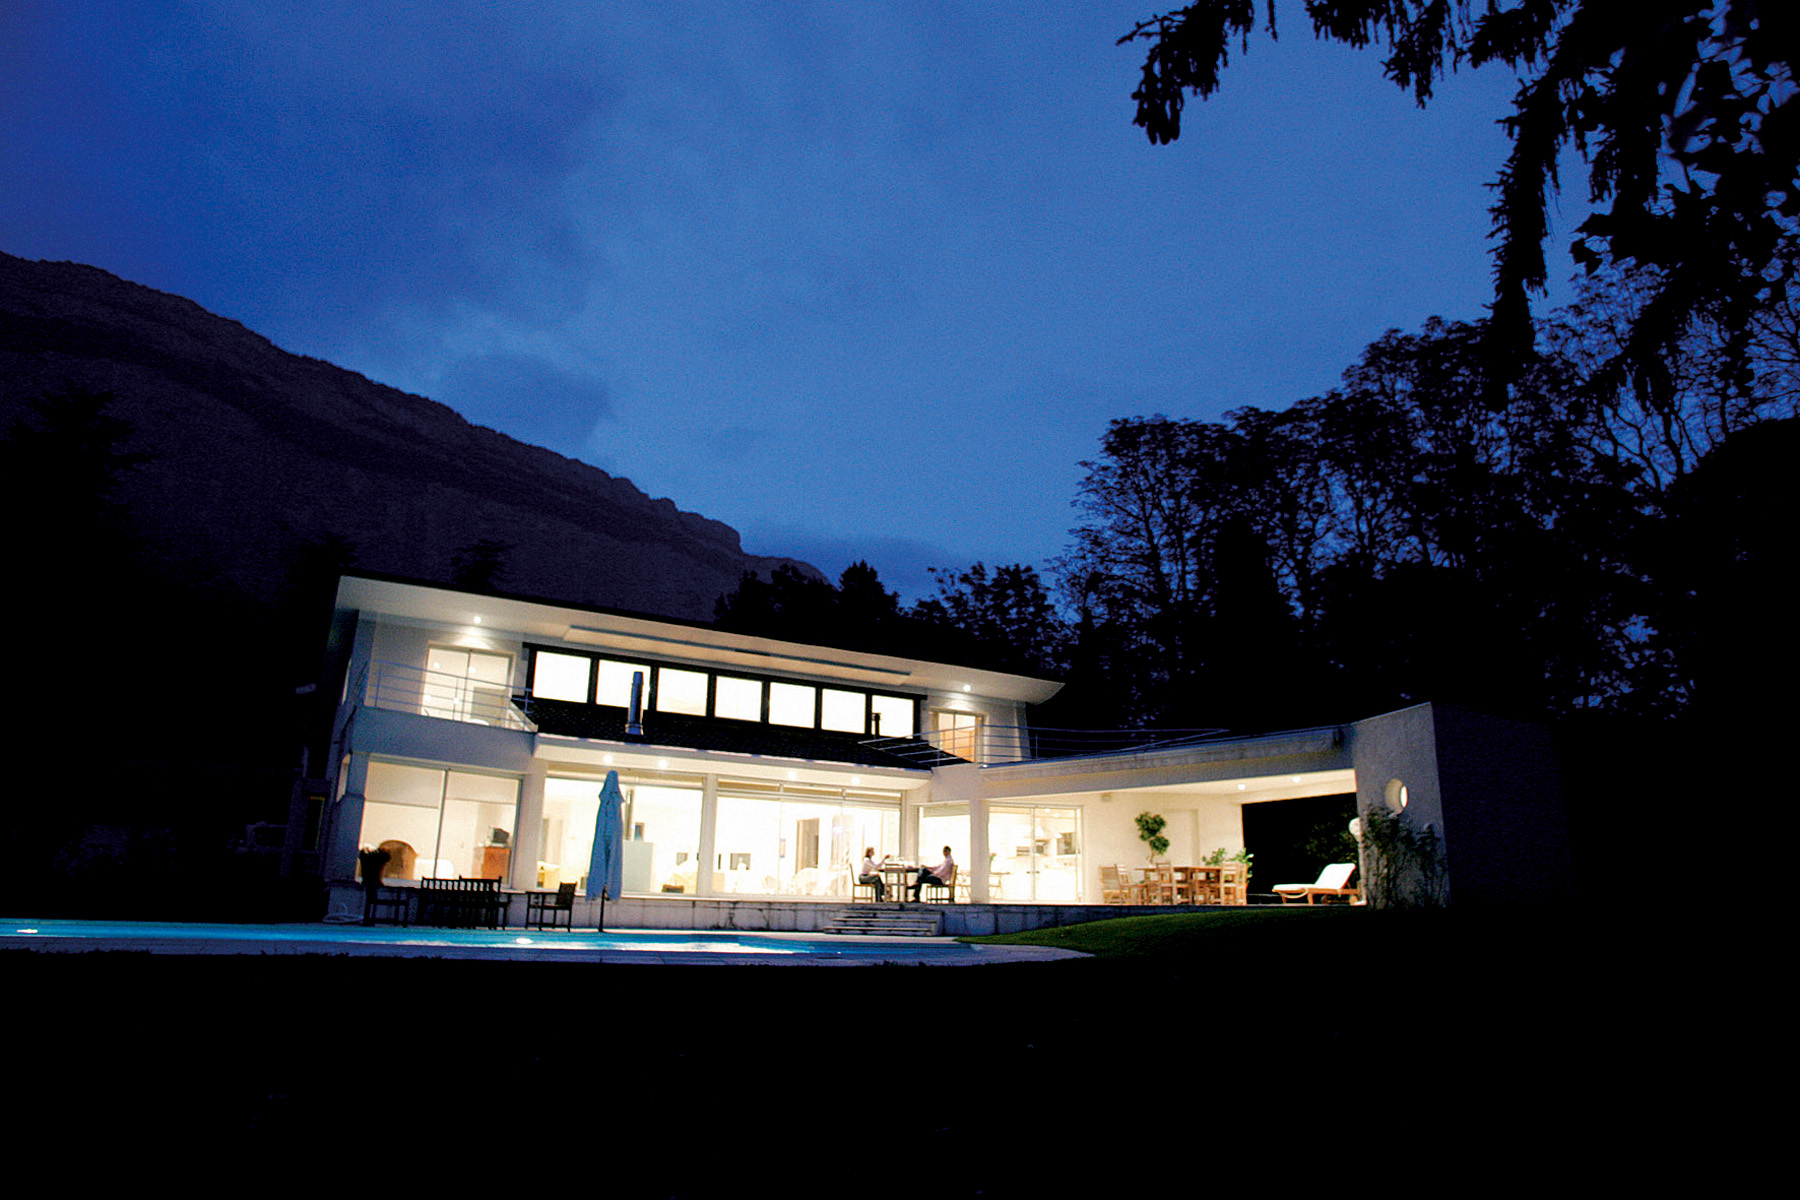 Janik architecte maison individuelle meylan 1 for Architecte grenoble maison individuelle